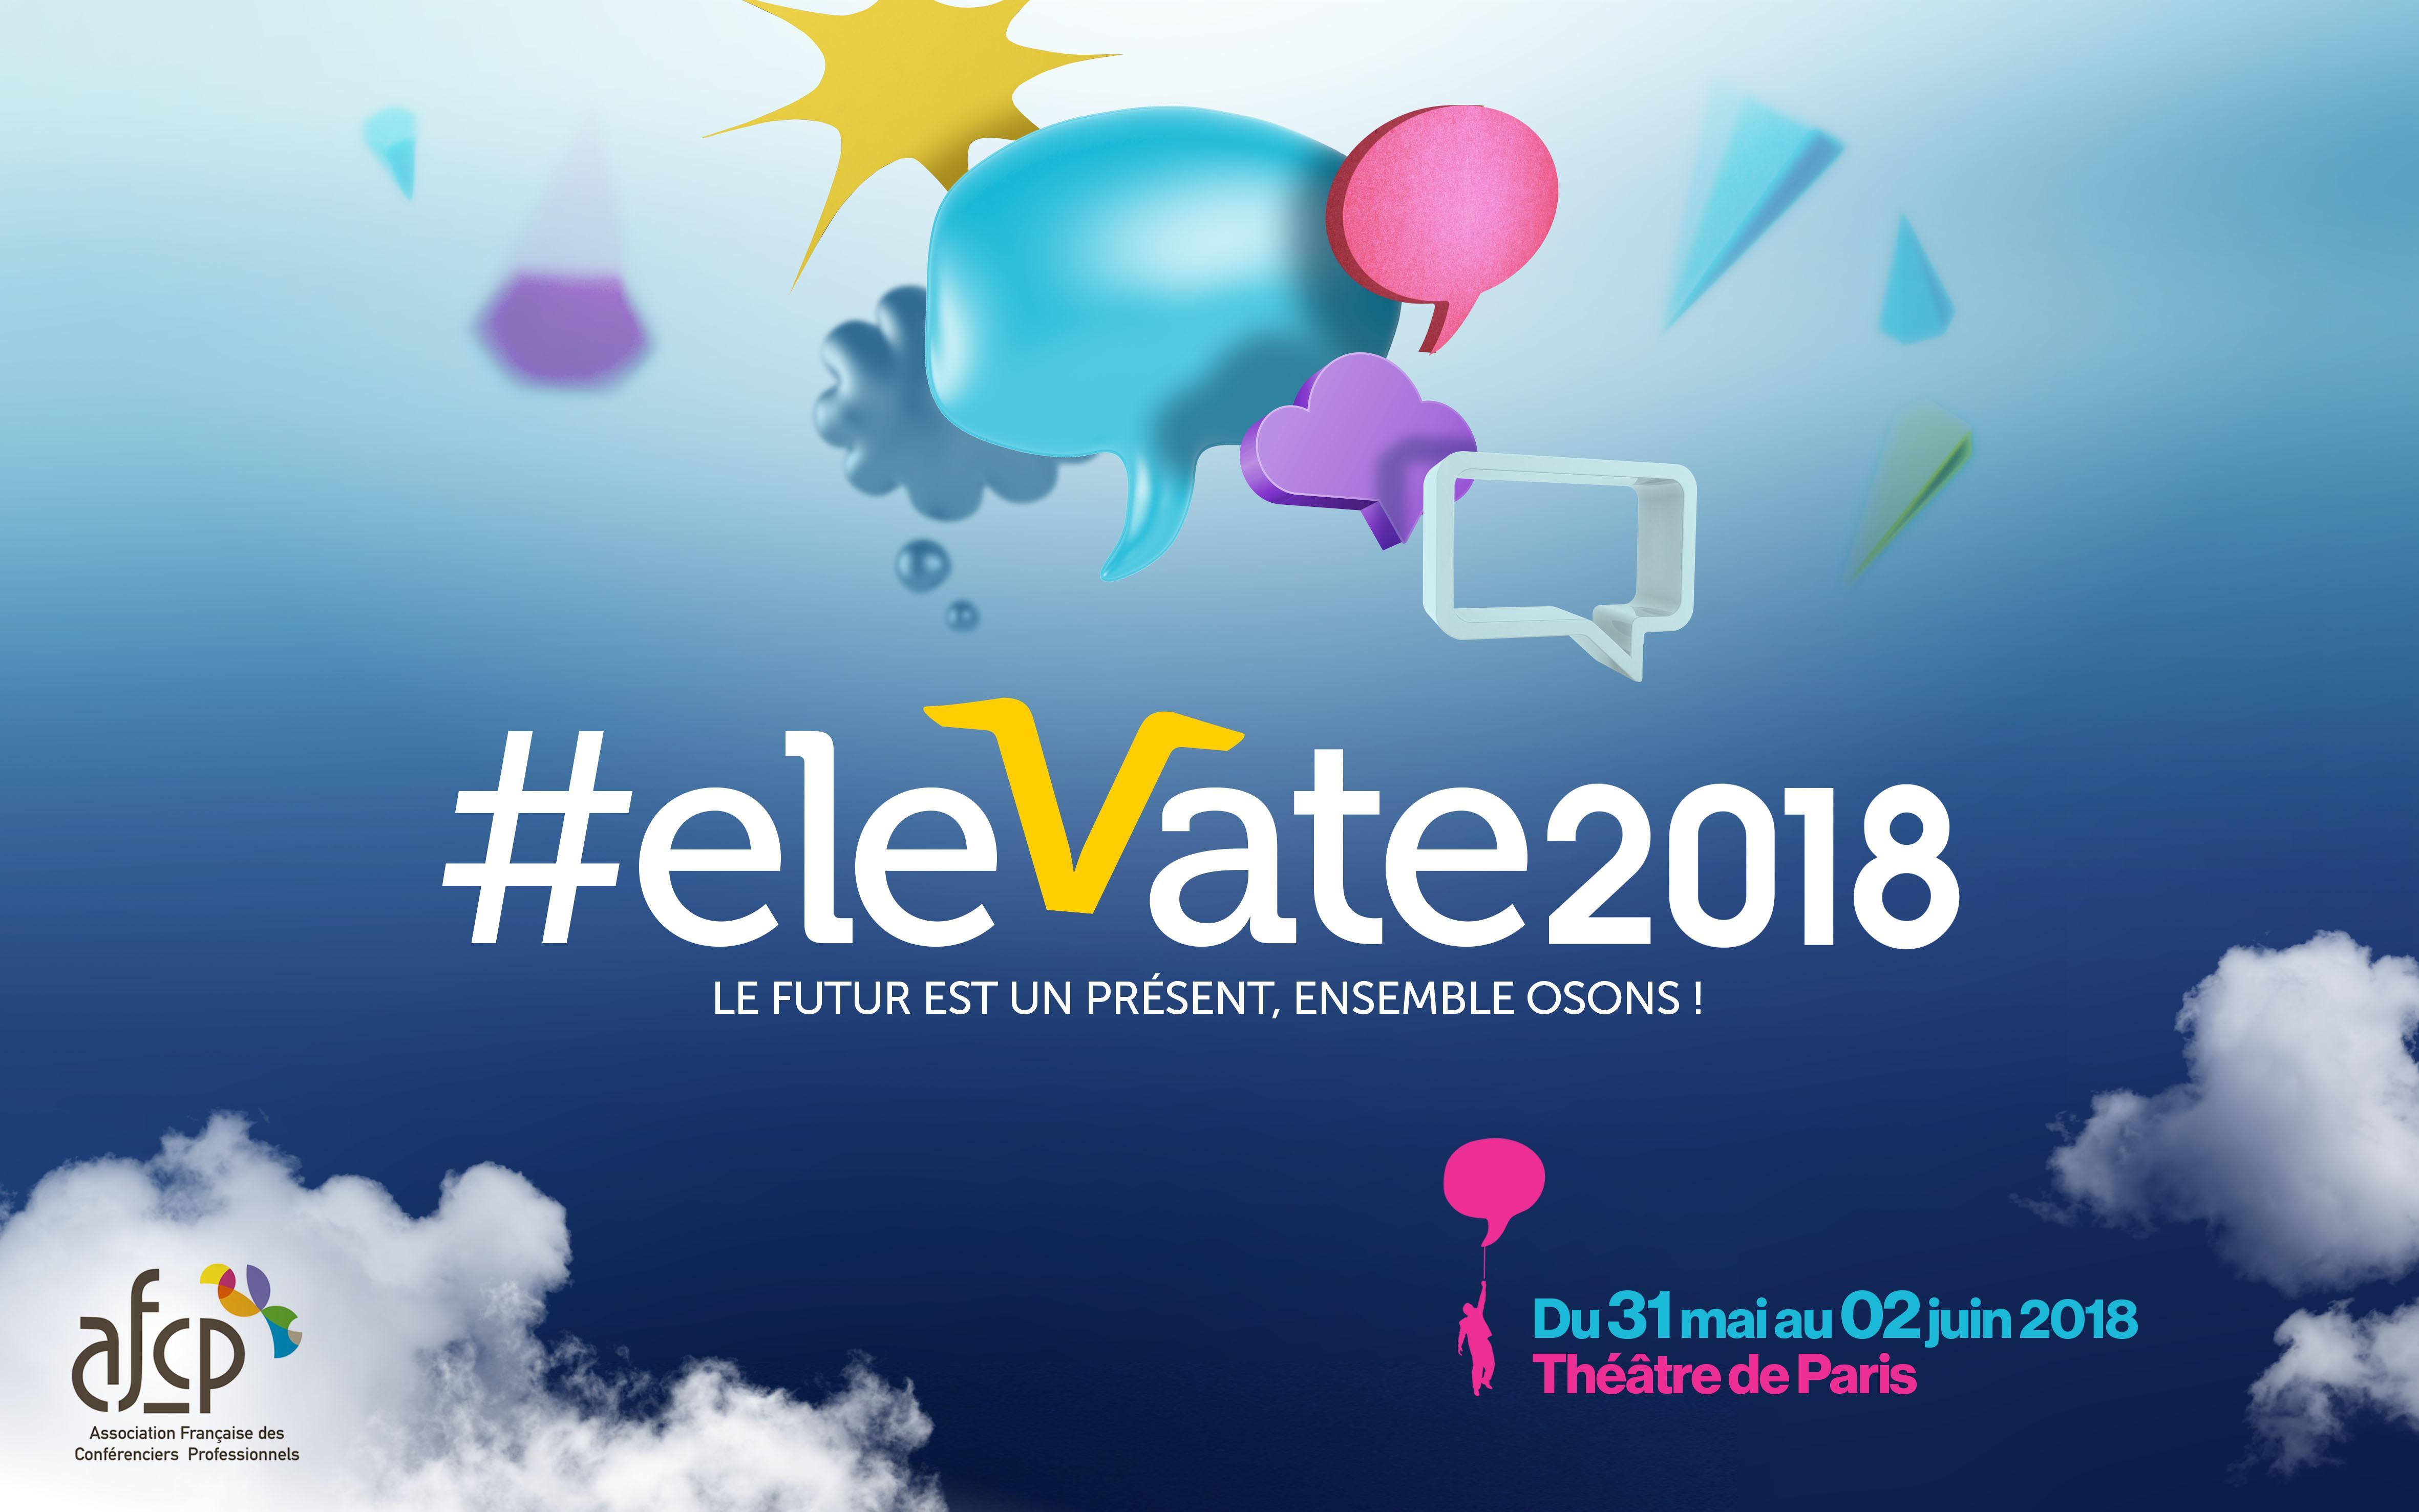 elevate2018